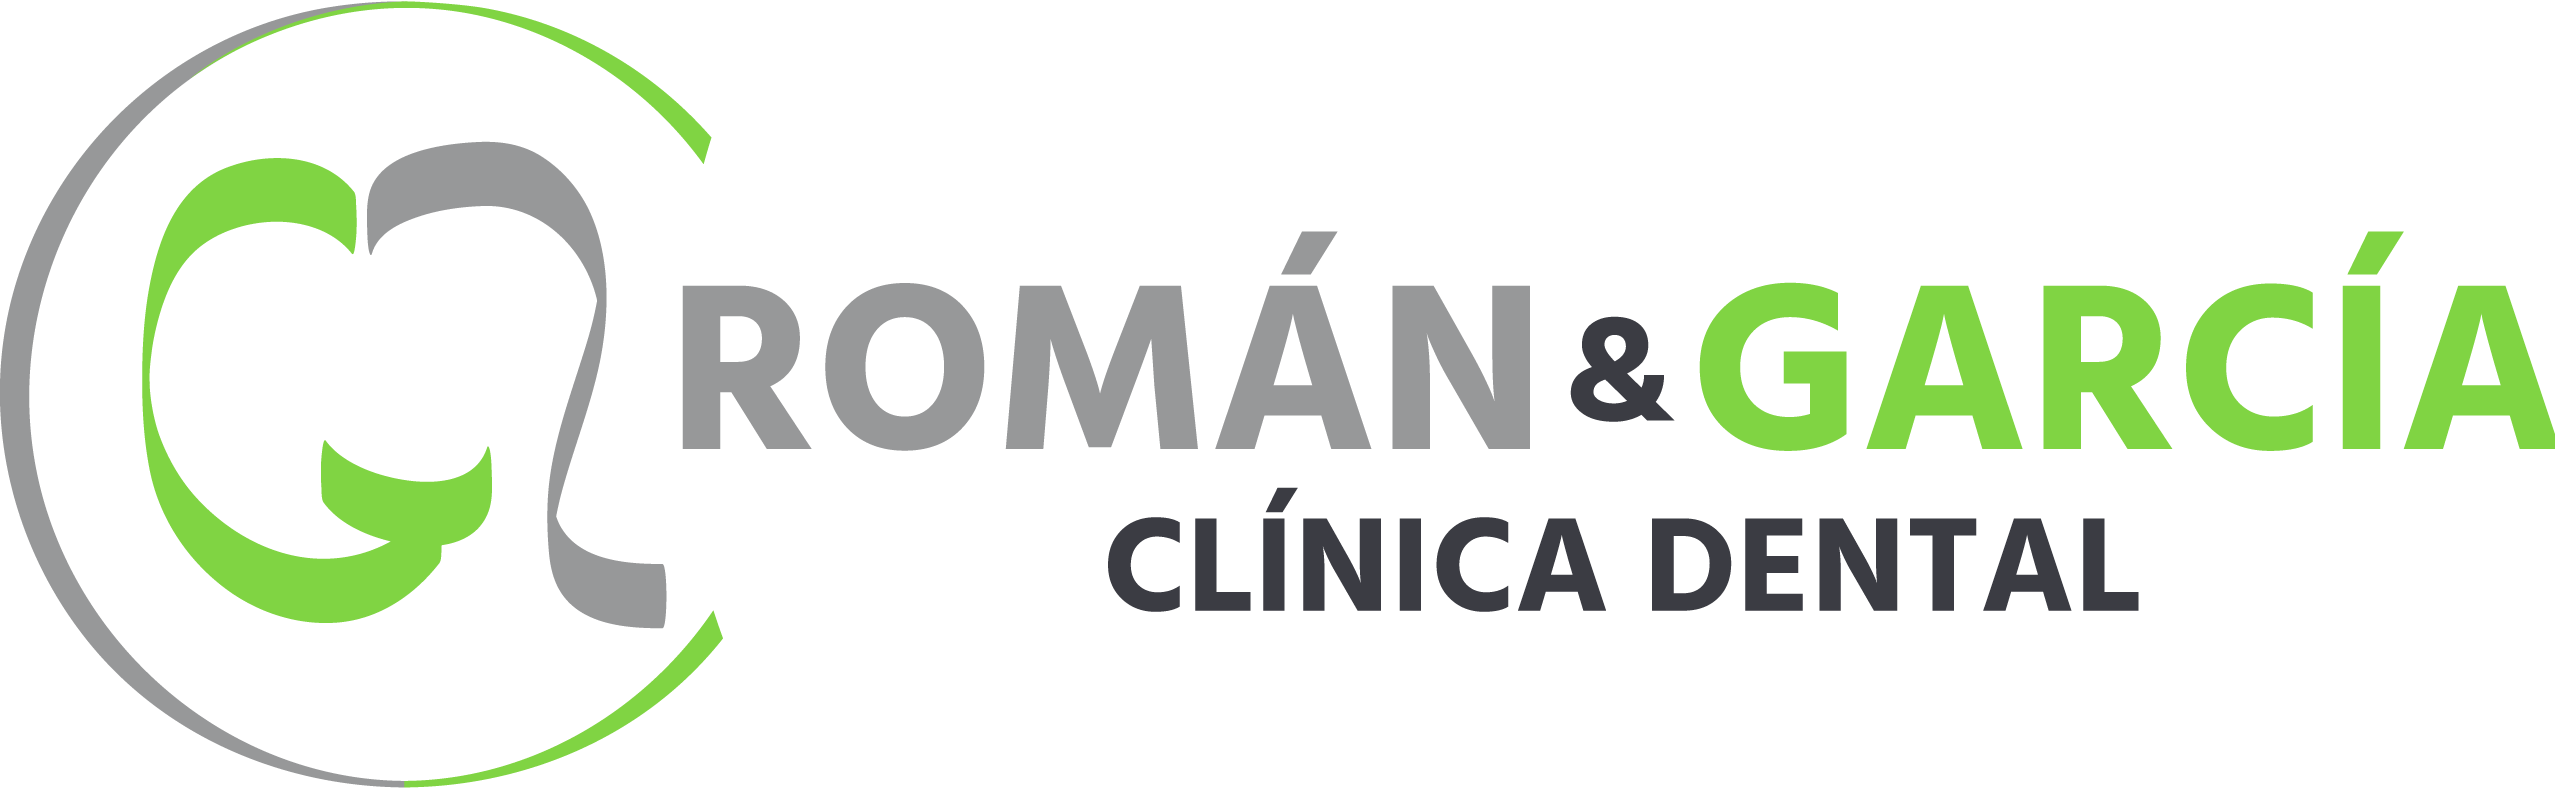 Clínica Dental Román & García - Clínica dental en Zaragoza